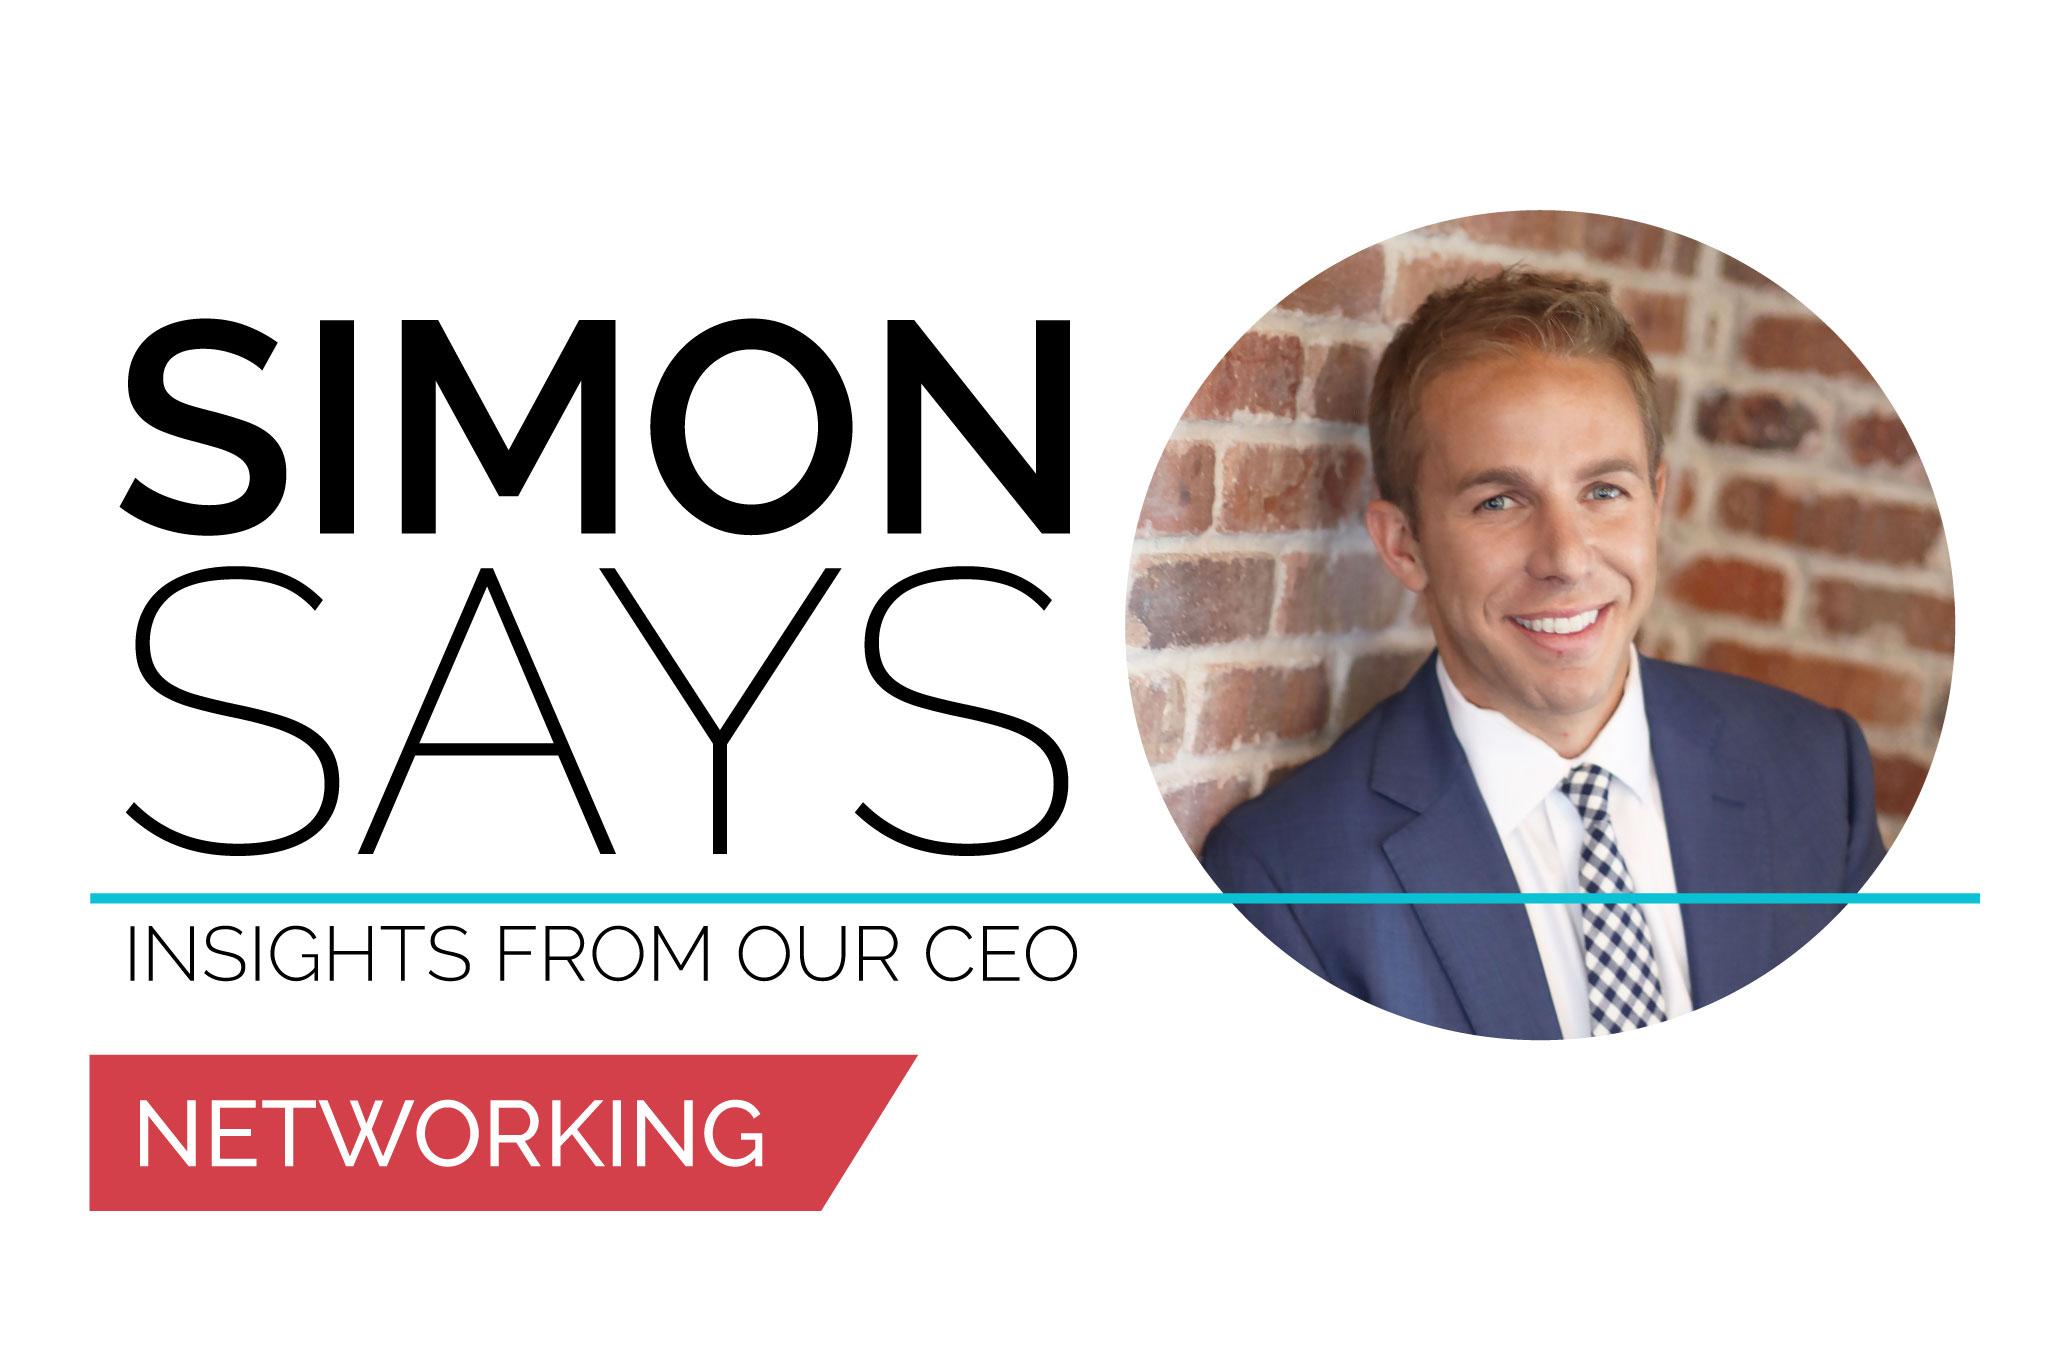 Four Keys to Networking Like a Champ